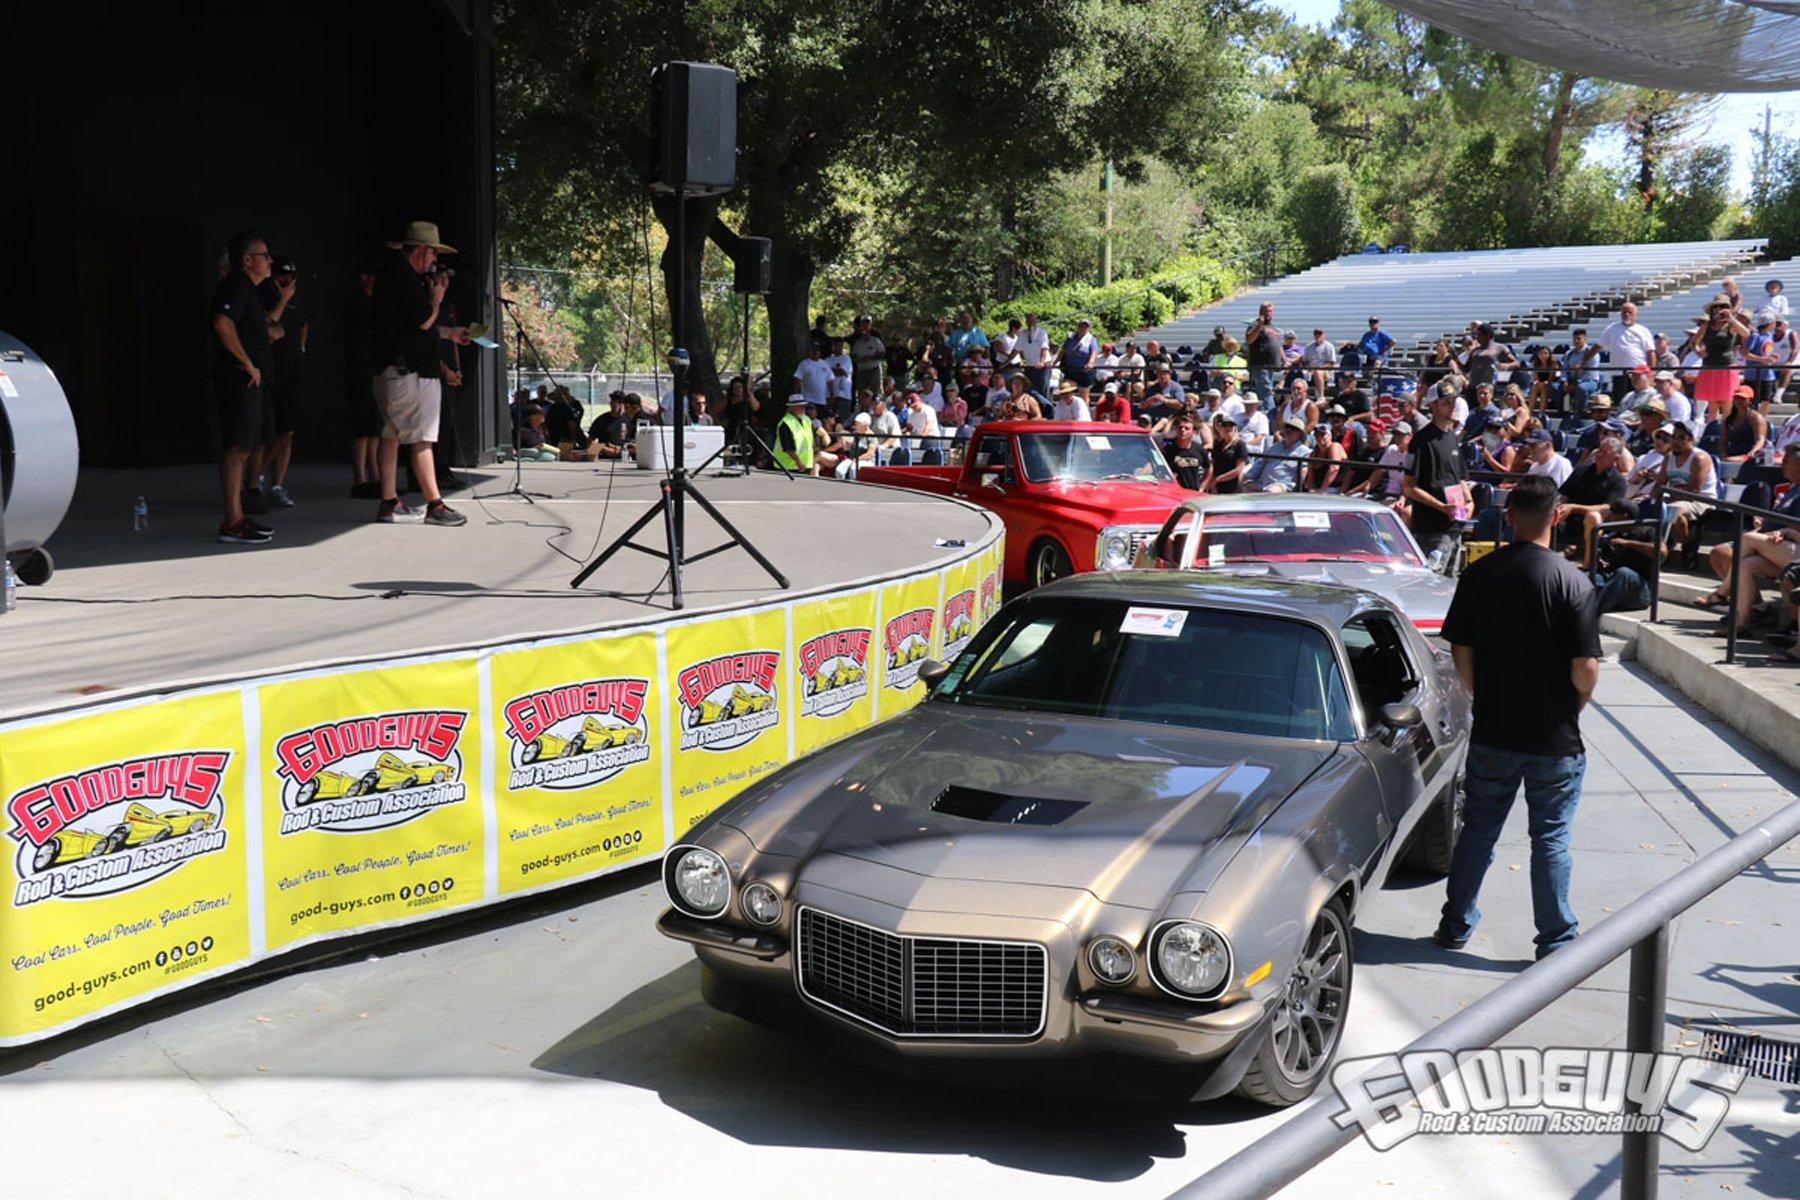 Goodguys Are Coming Back To Pleasanton California - The good guys auto